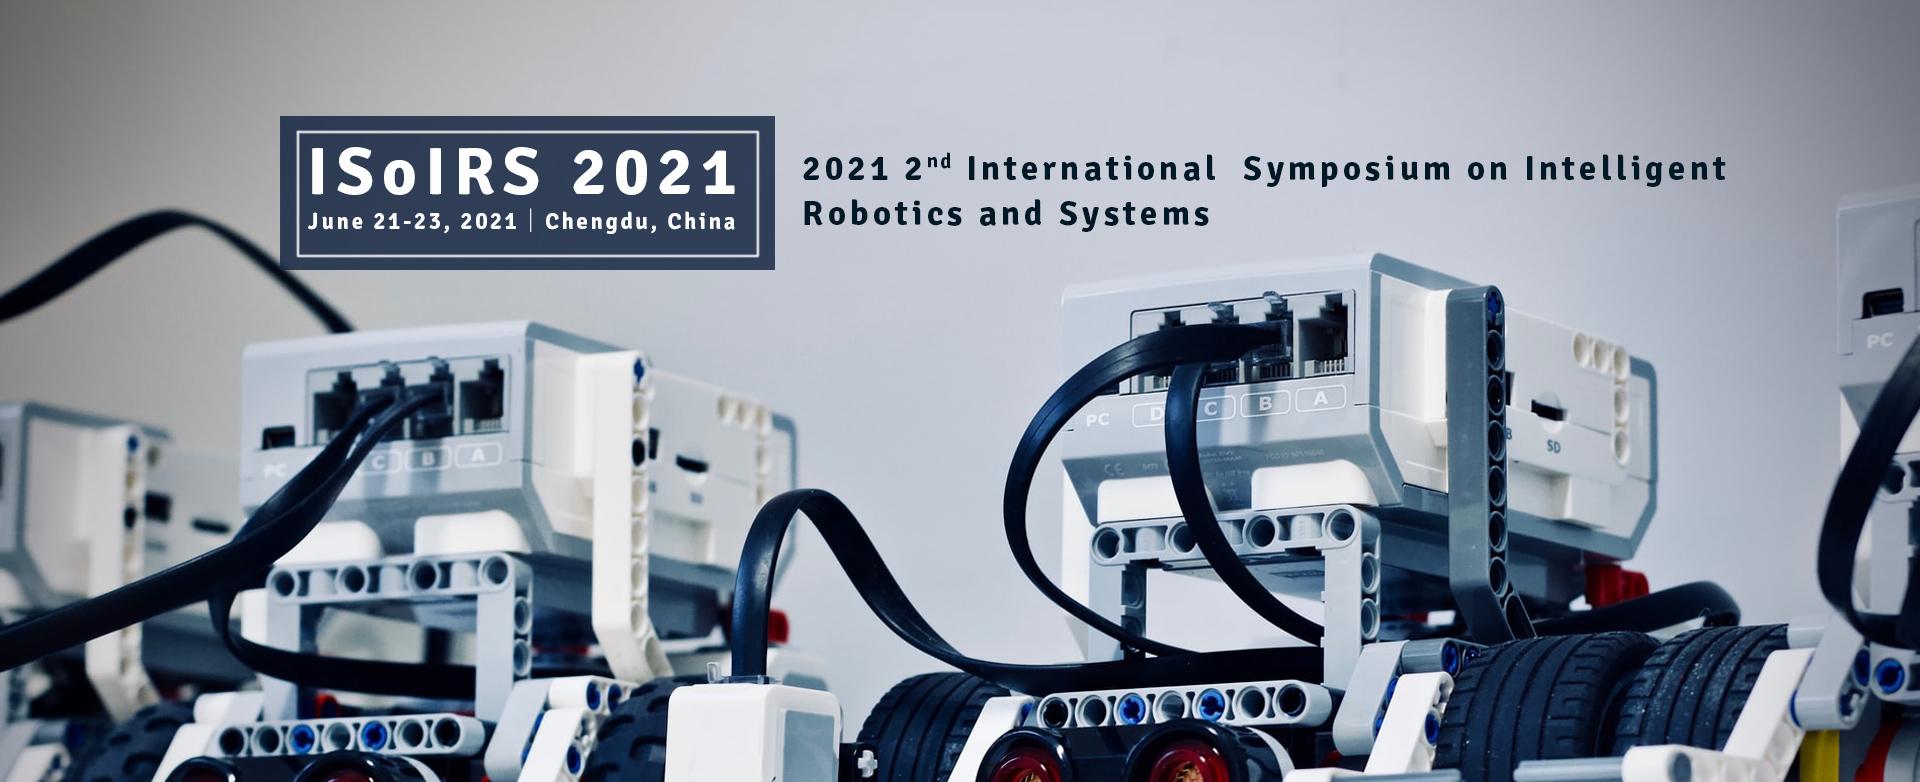 International Symposium on Intelligent Robotics and Systems (ISoIRS 2021)